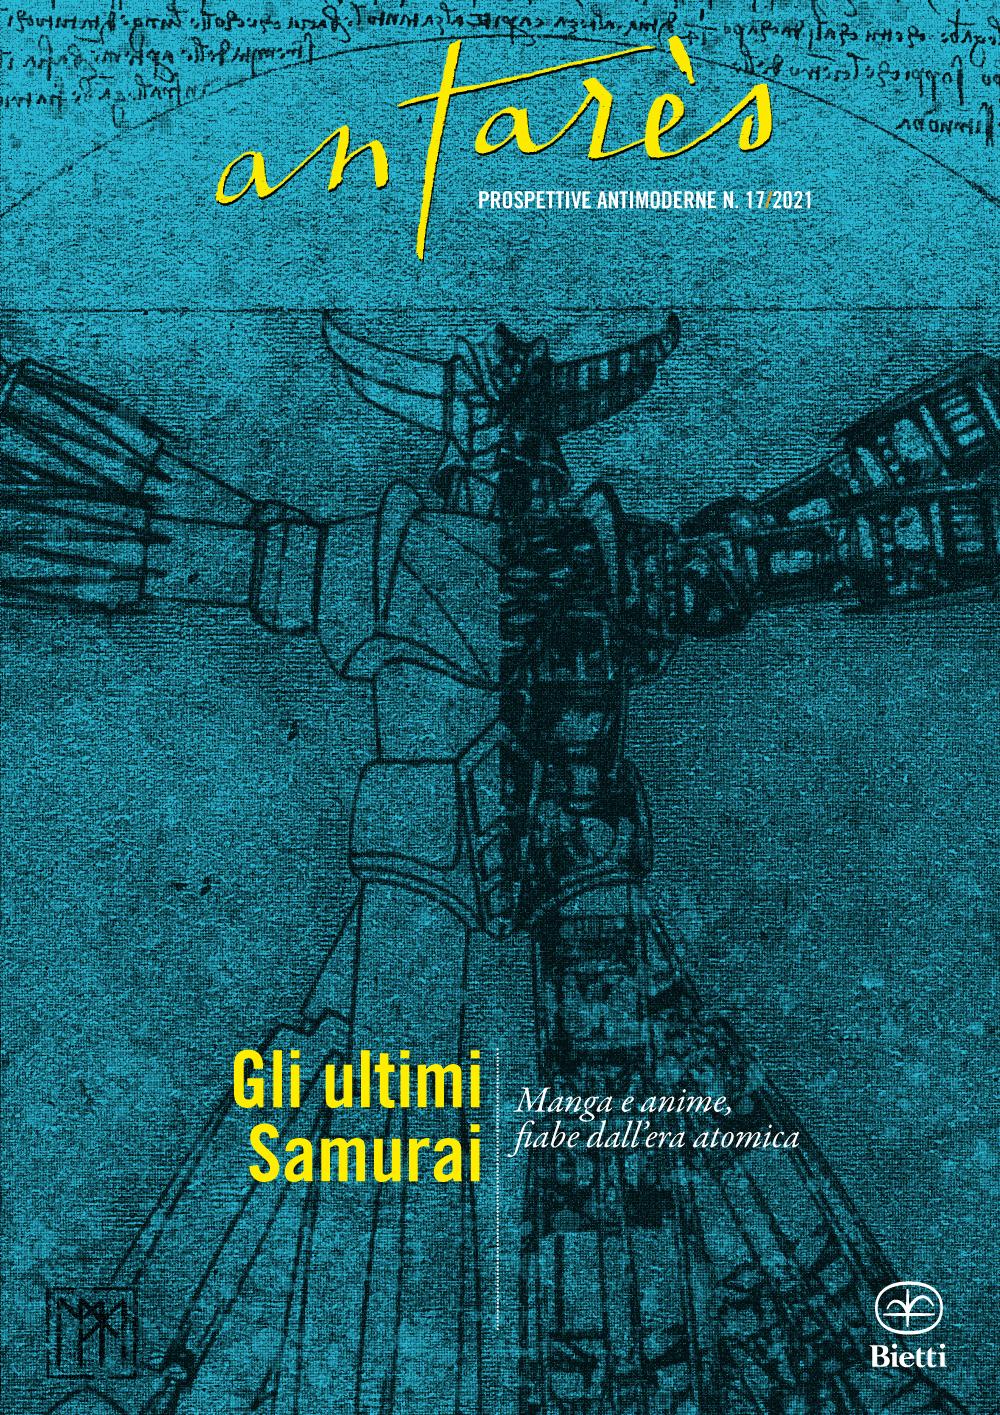 Gli ultimi Samurai - Anime e manga, fiabe dall'era atomica